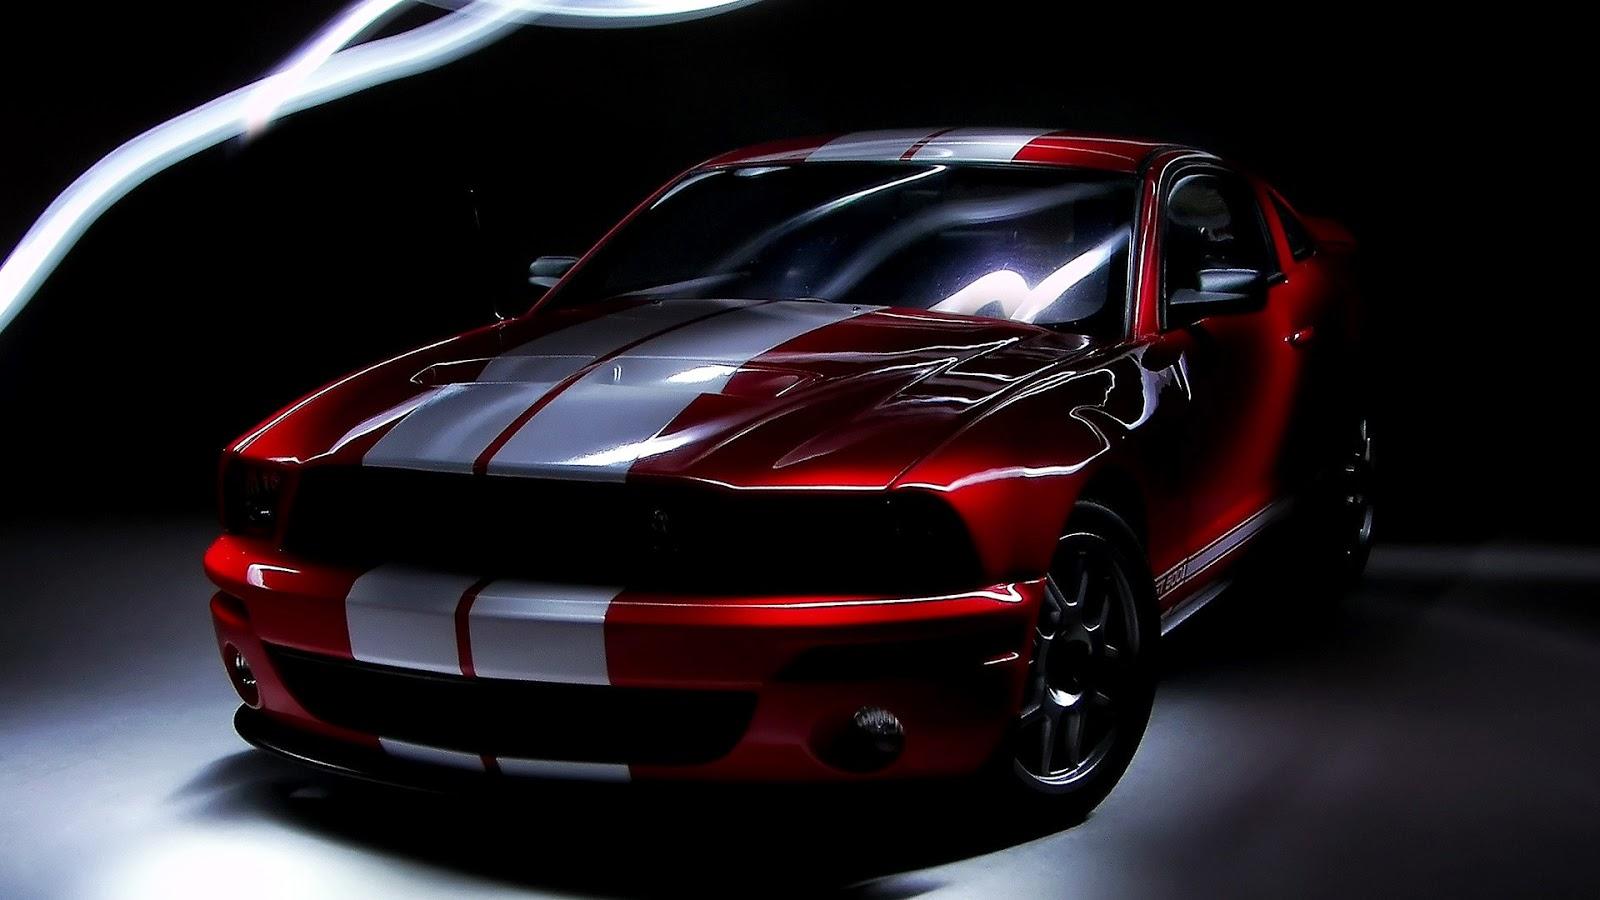 55 Ford Cars Wallpaper Hd Top Cars Wallpaper Hd